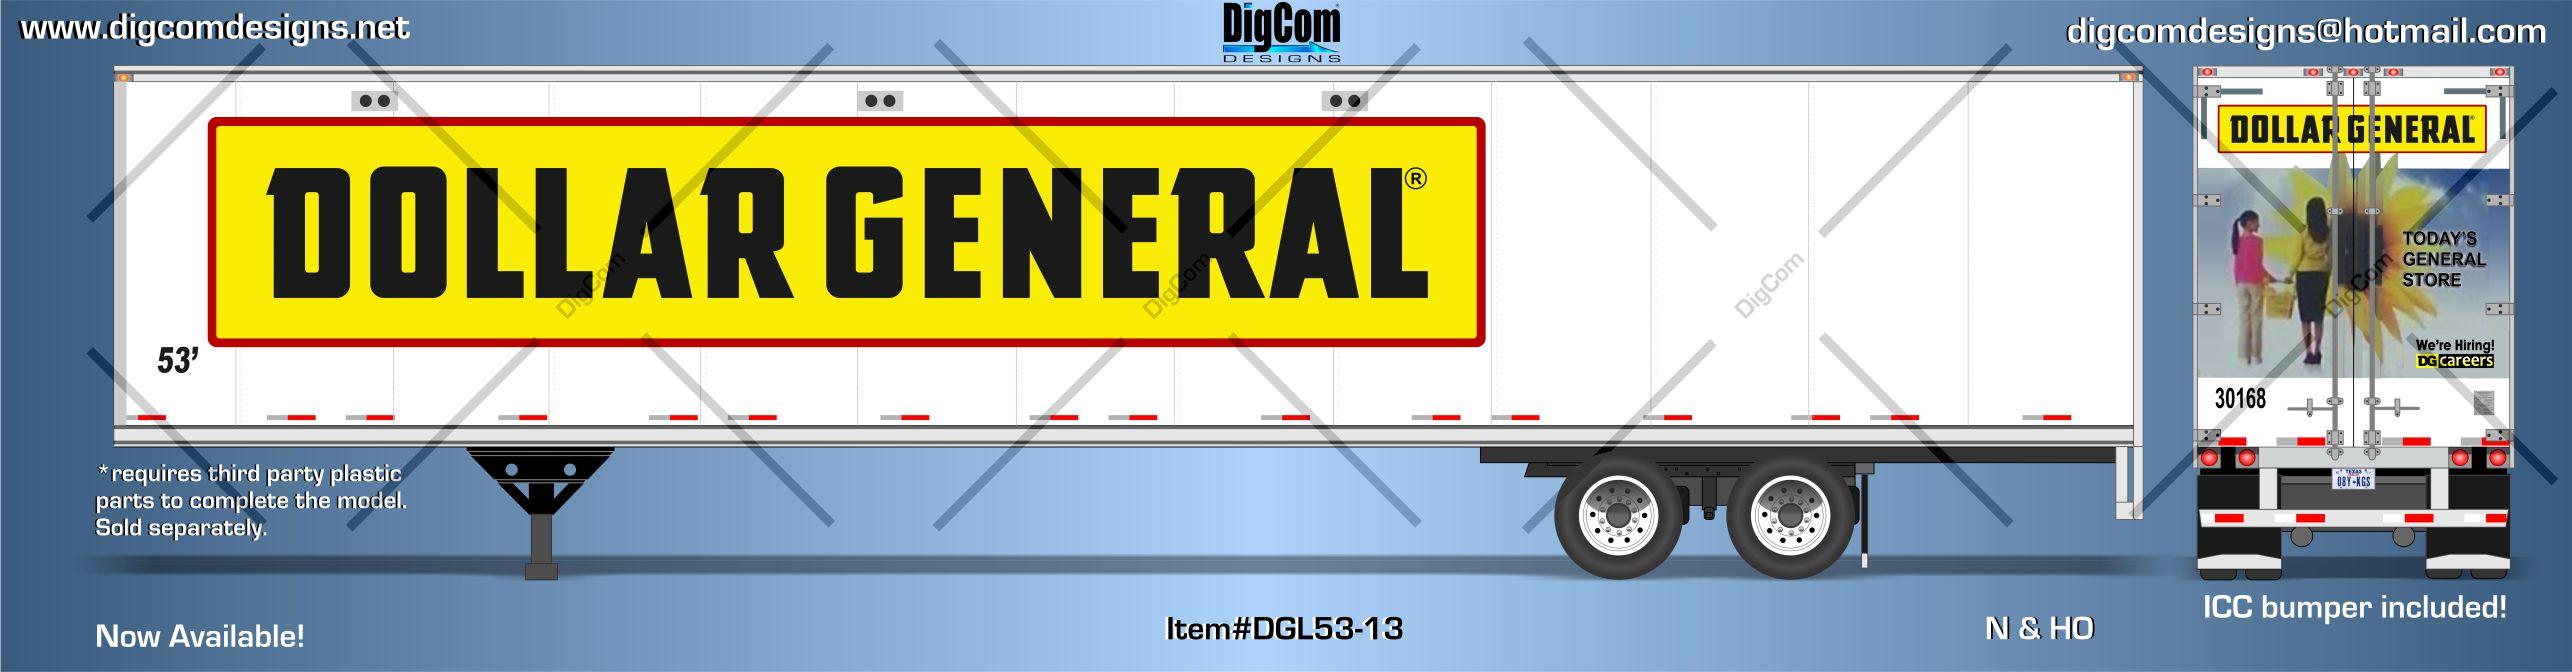 DOLLAR GENERAL DESIGN.jpg